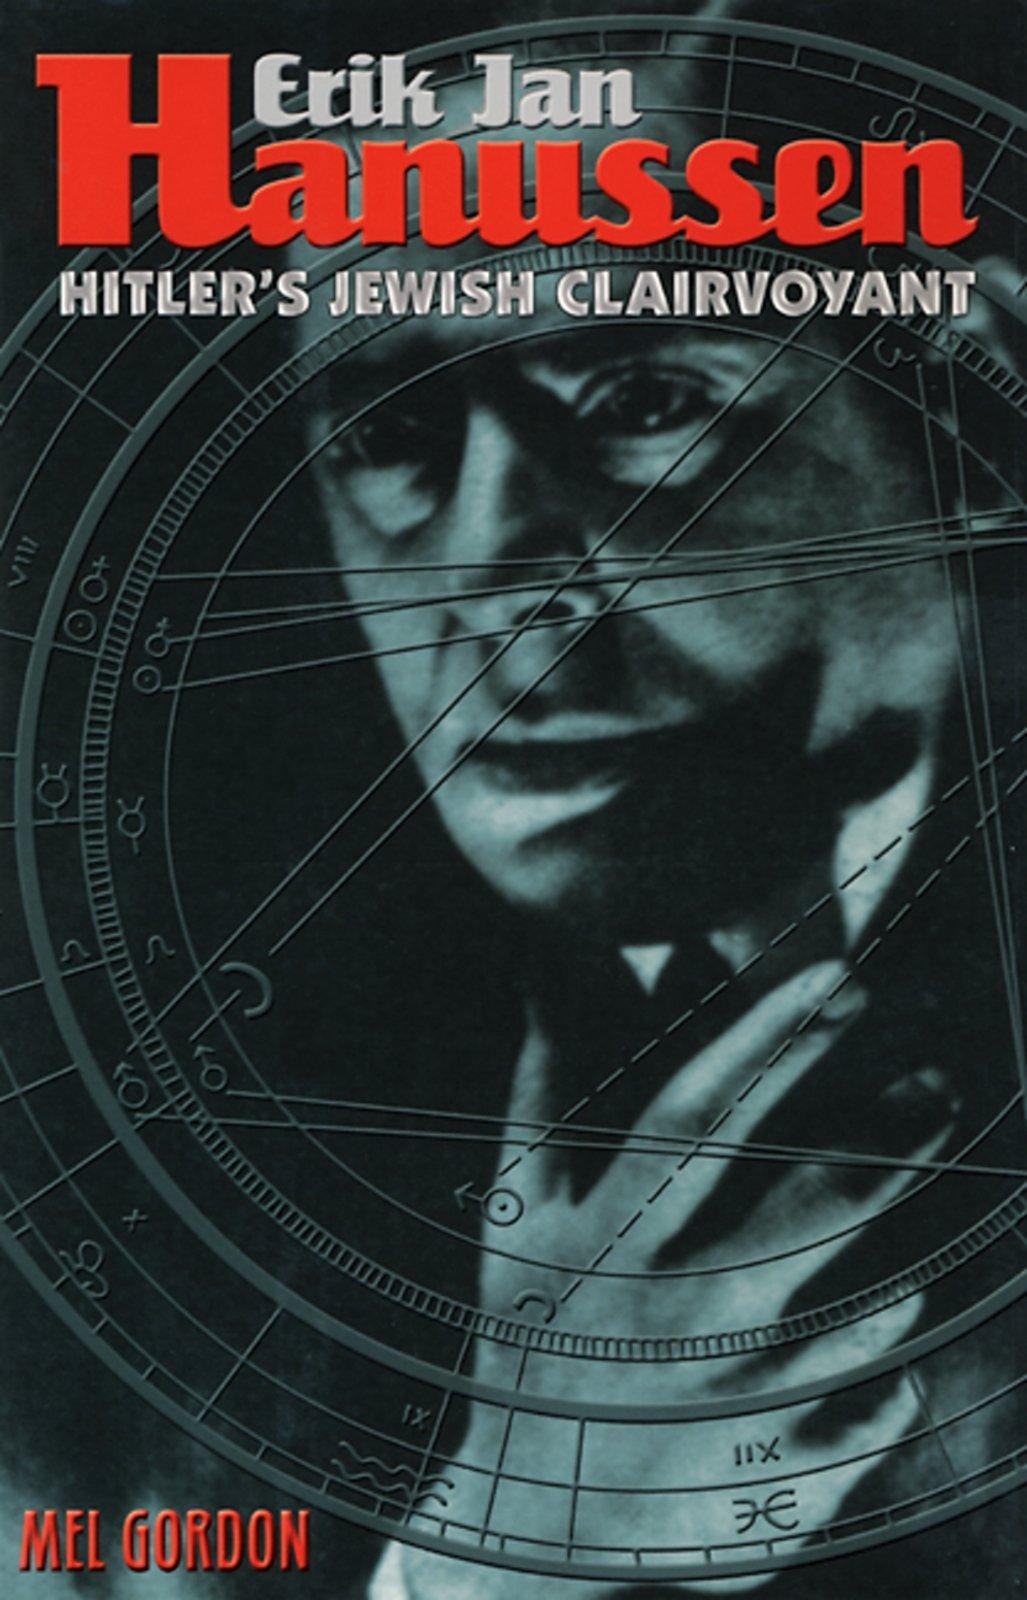 Erik Jan Hanussen  Hitler's Jewish Clairvoyant